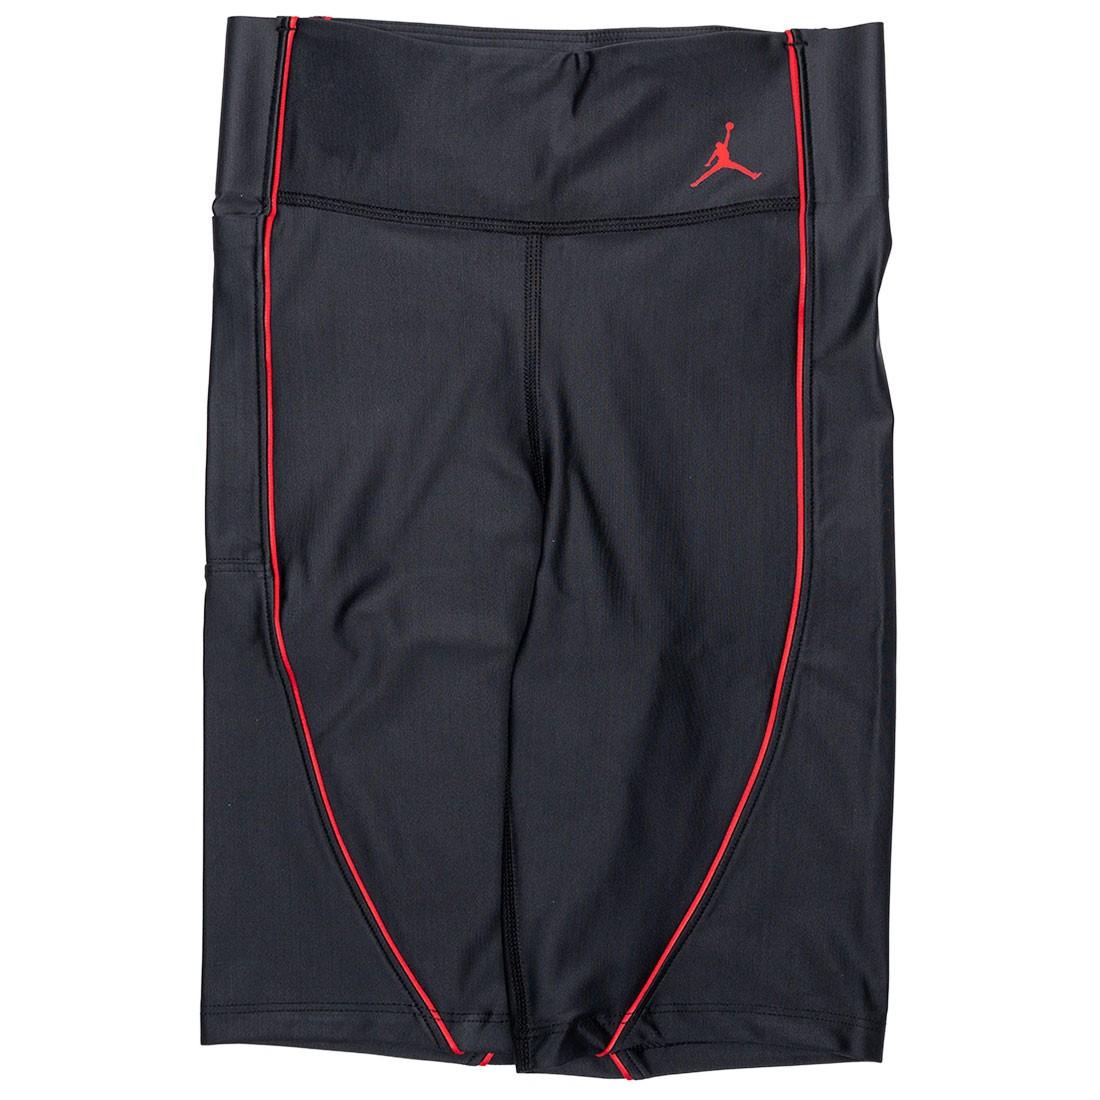 Jordan Women Essential Nike Shorts (black / black / university red)